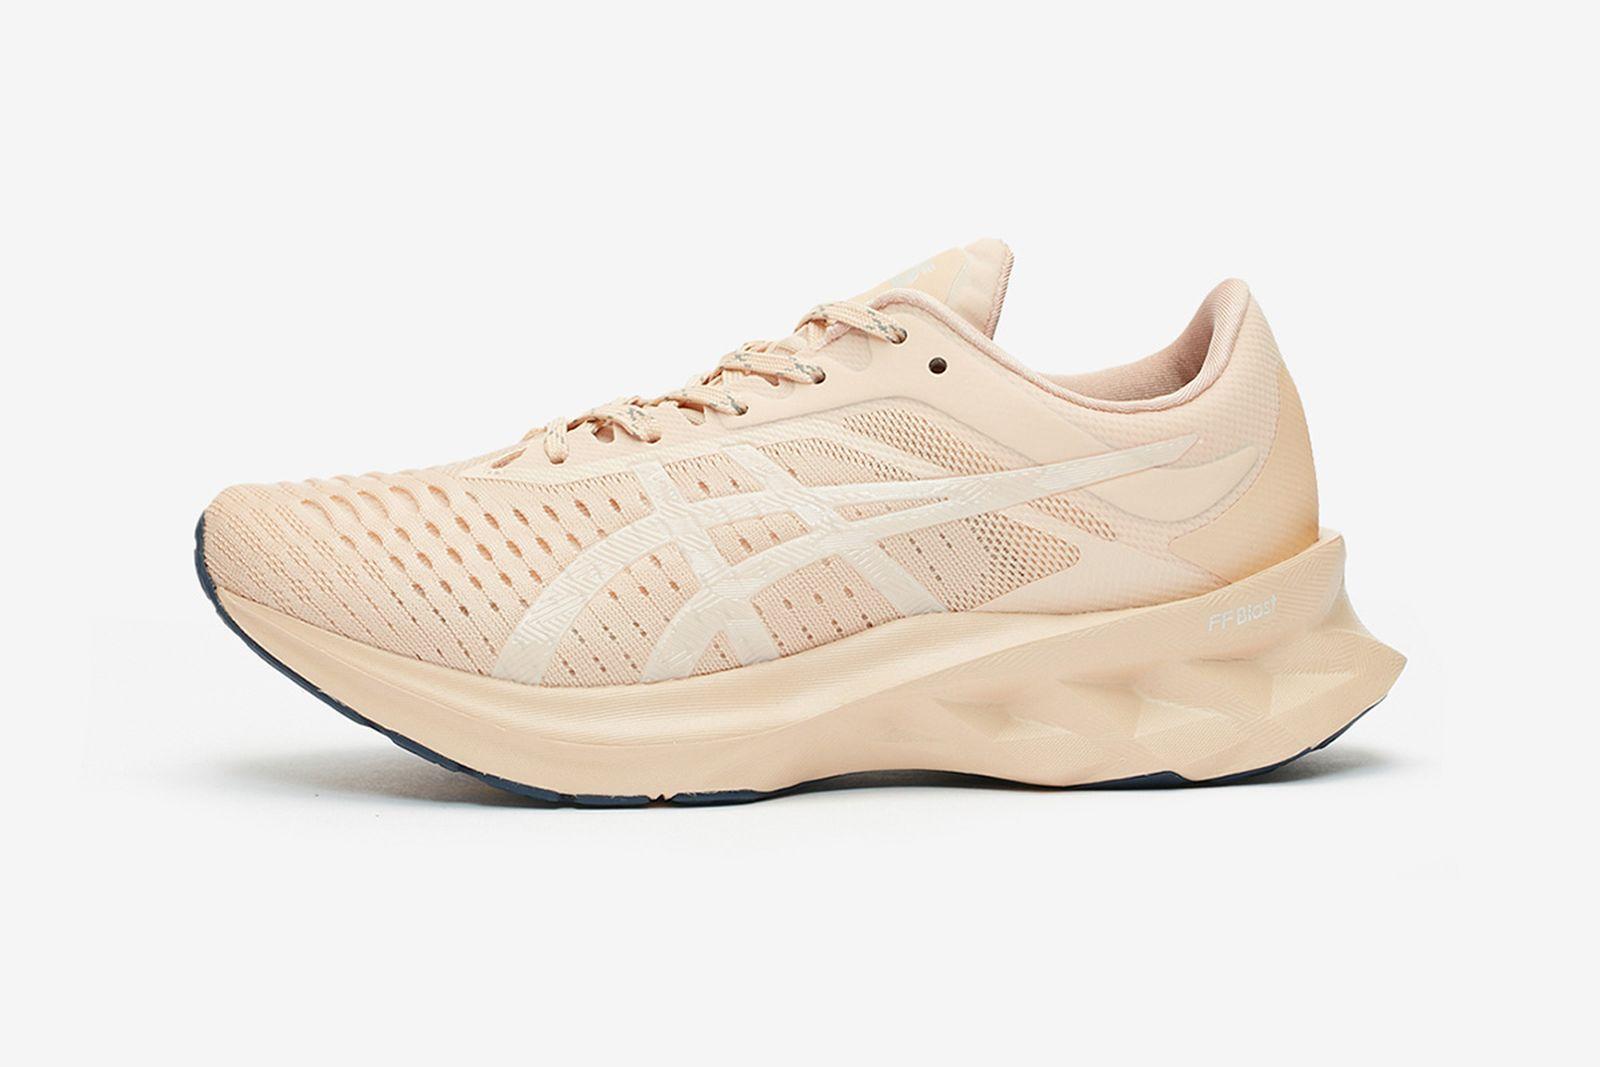 sneakersnstuff-asics-novablast-release-date-price-06